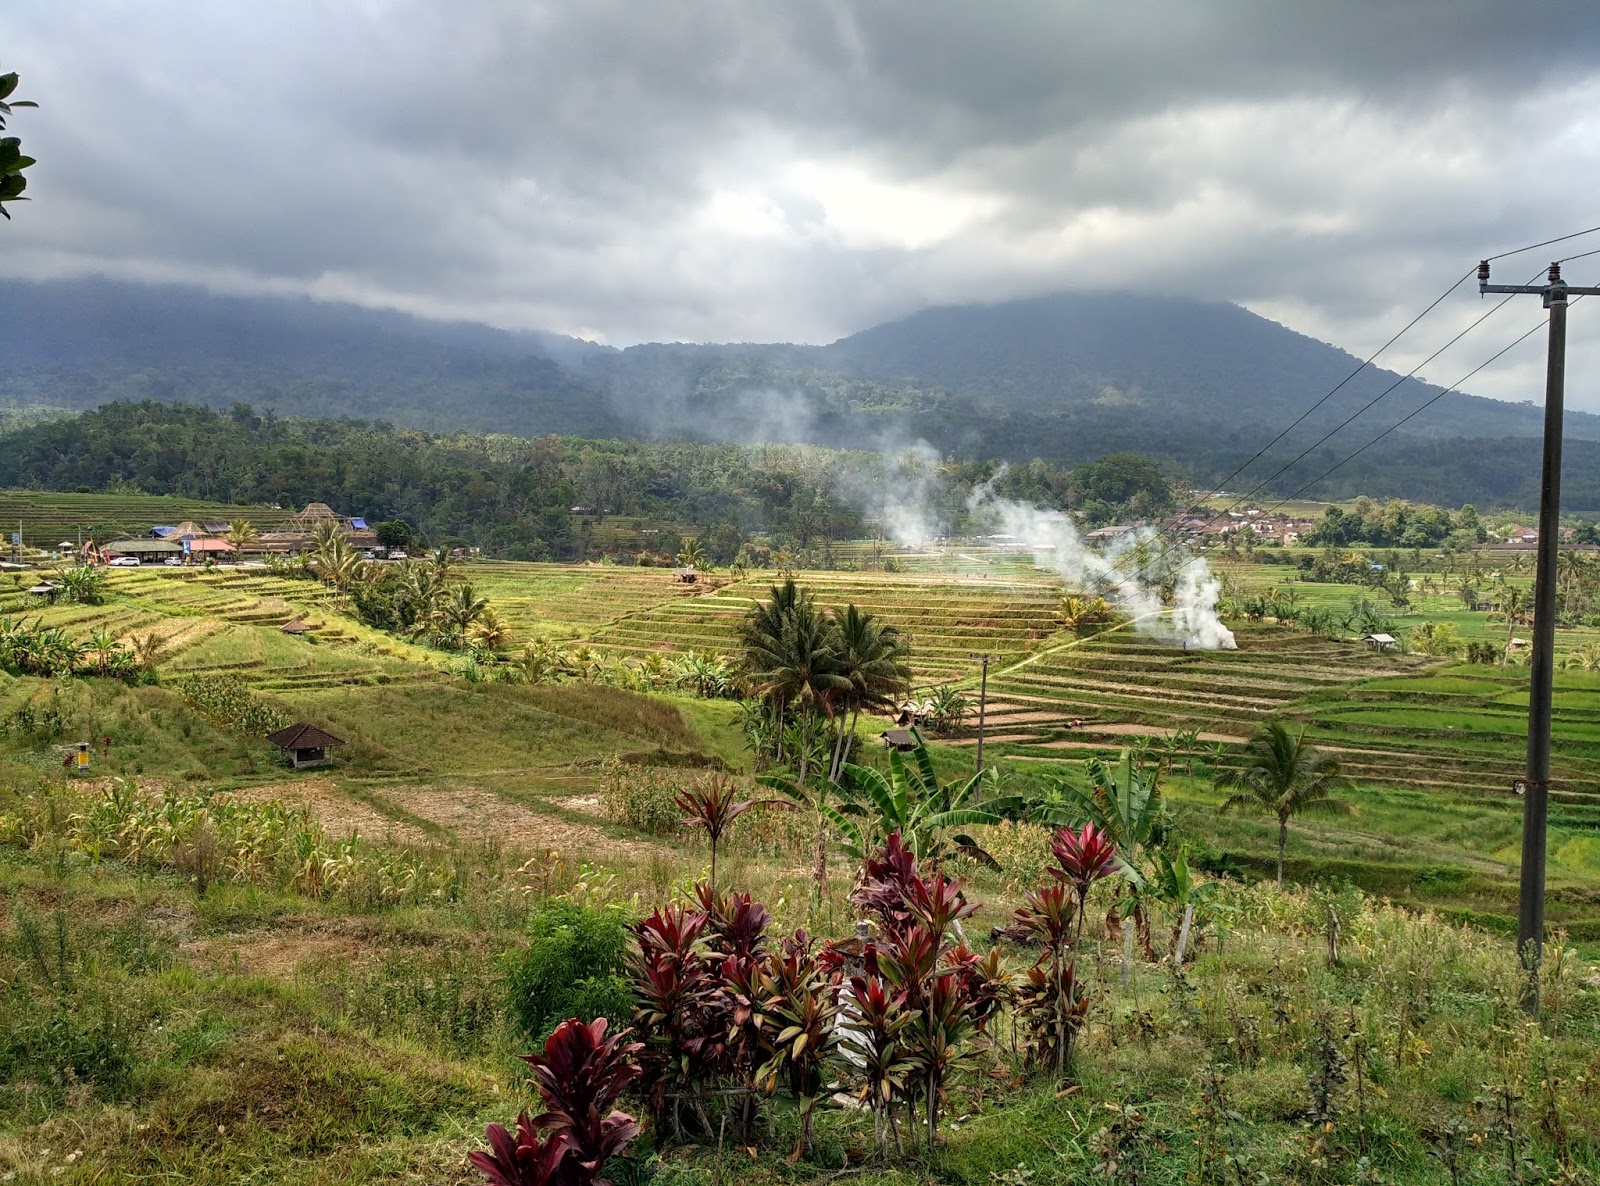 Niya 39 s world rice terrace in ubud bali indonesia for Terrace ubud bali